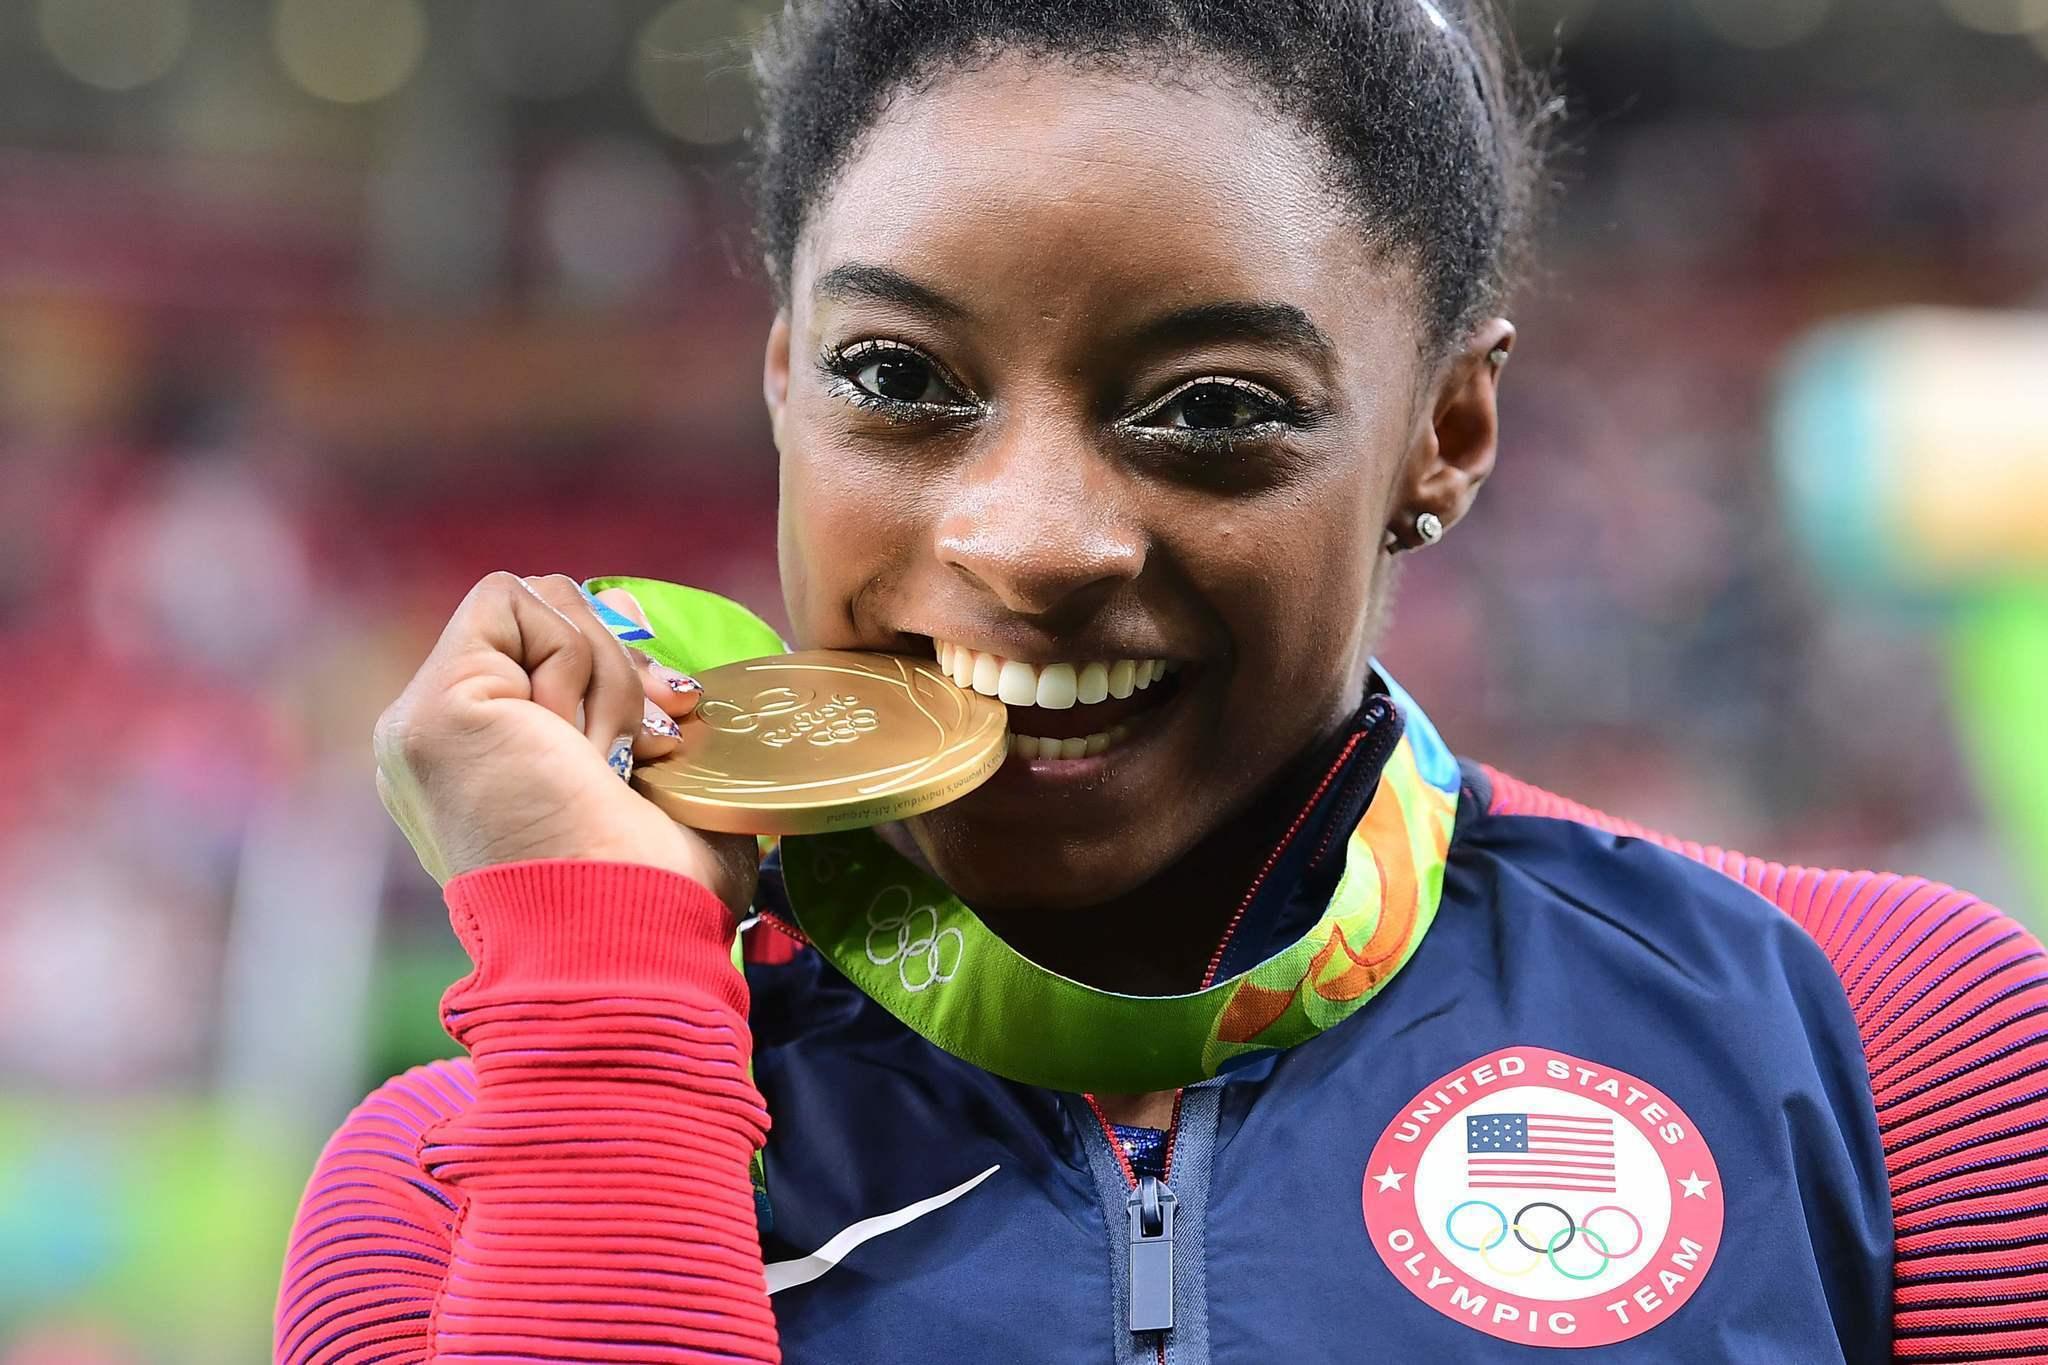 Olimpiyat madalyası